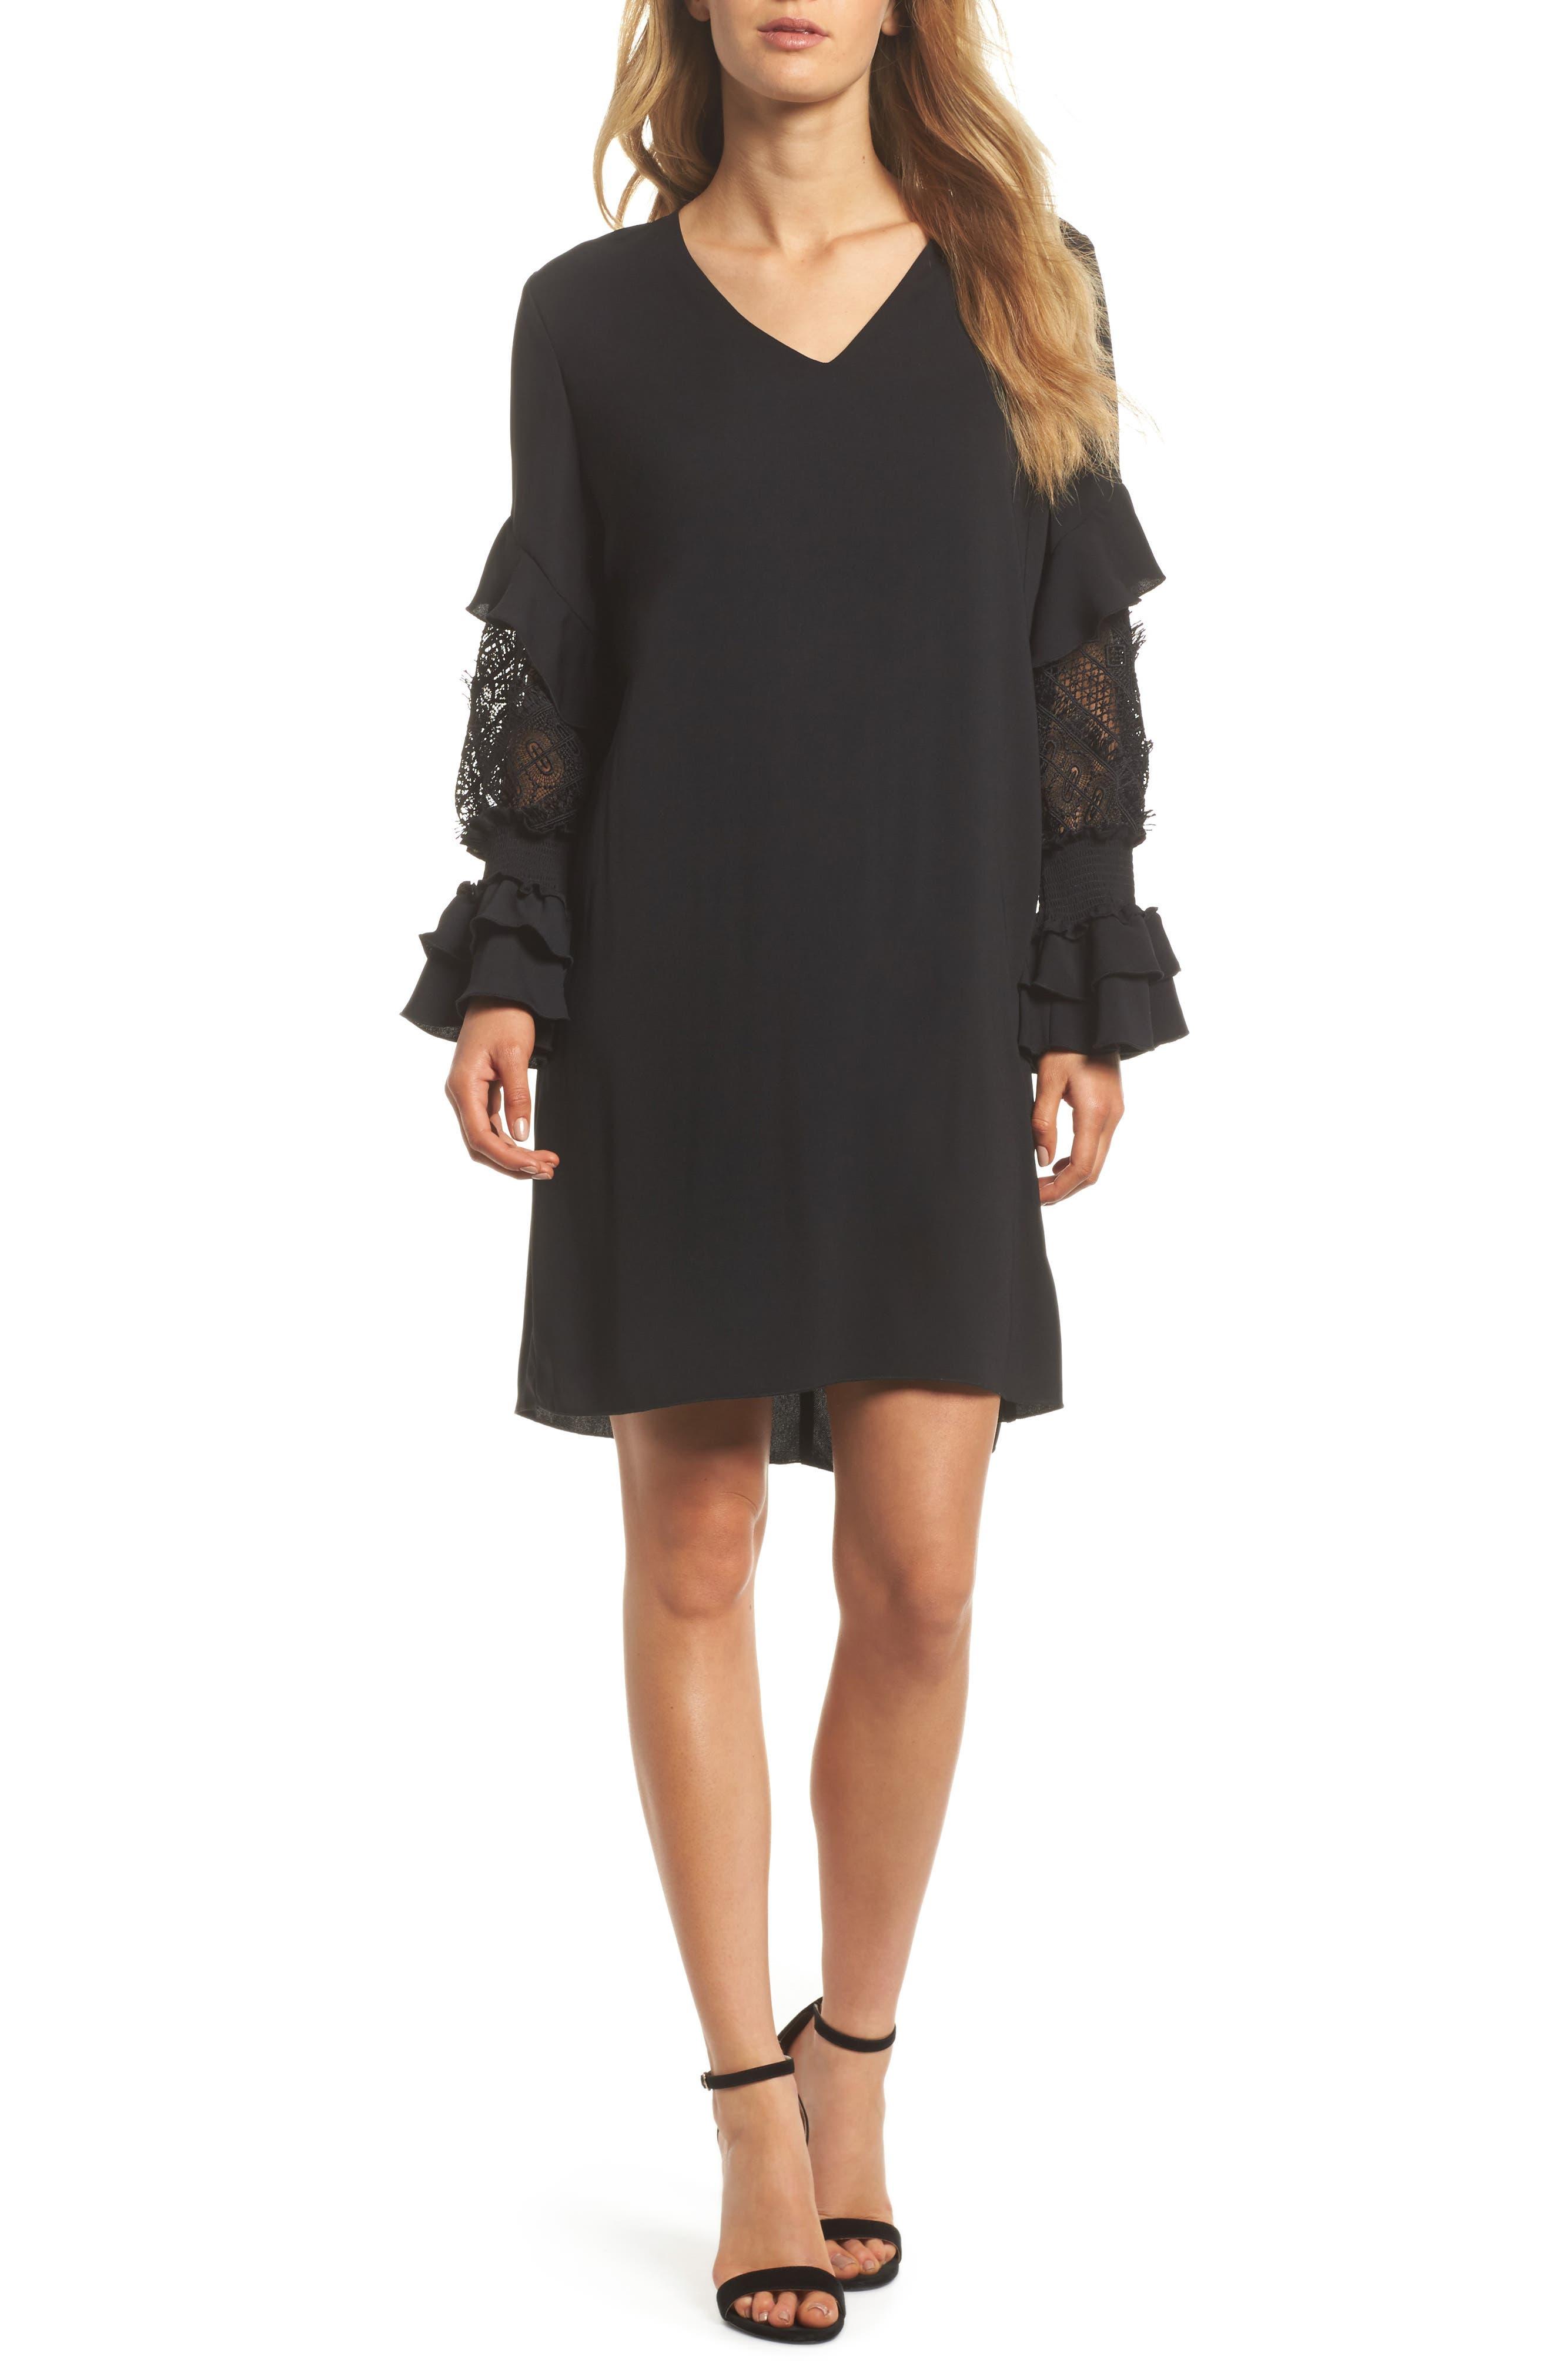 Alternate Image 1 Selected - Kobi Halperin Alda Lace Sleeve Shift Dress (Nordstrom Exclusive)